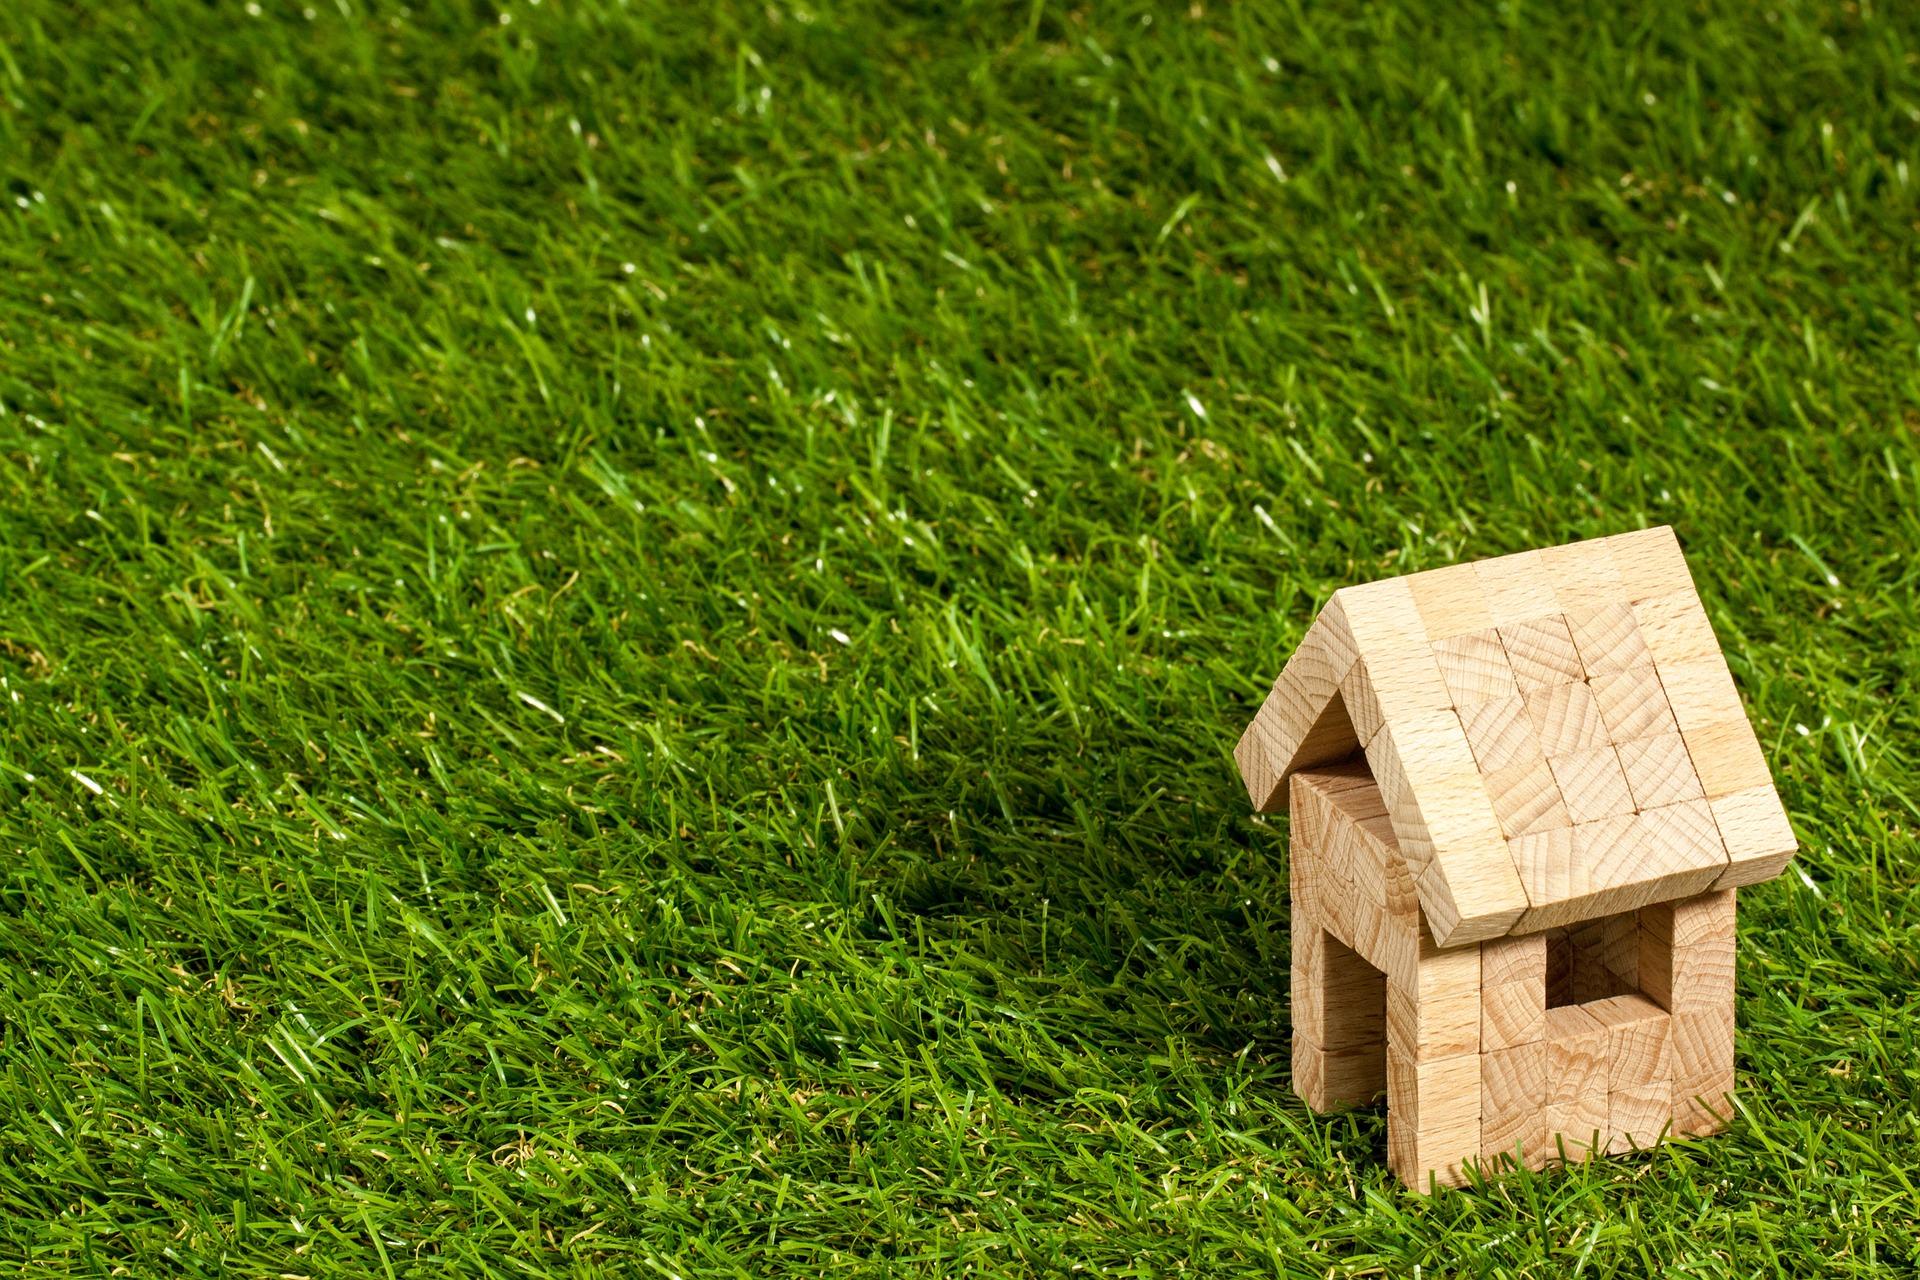 ипотечная квартира при банкротстве